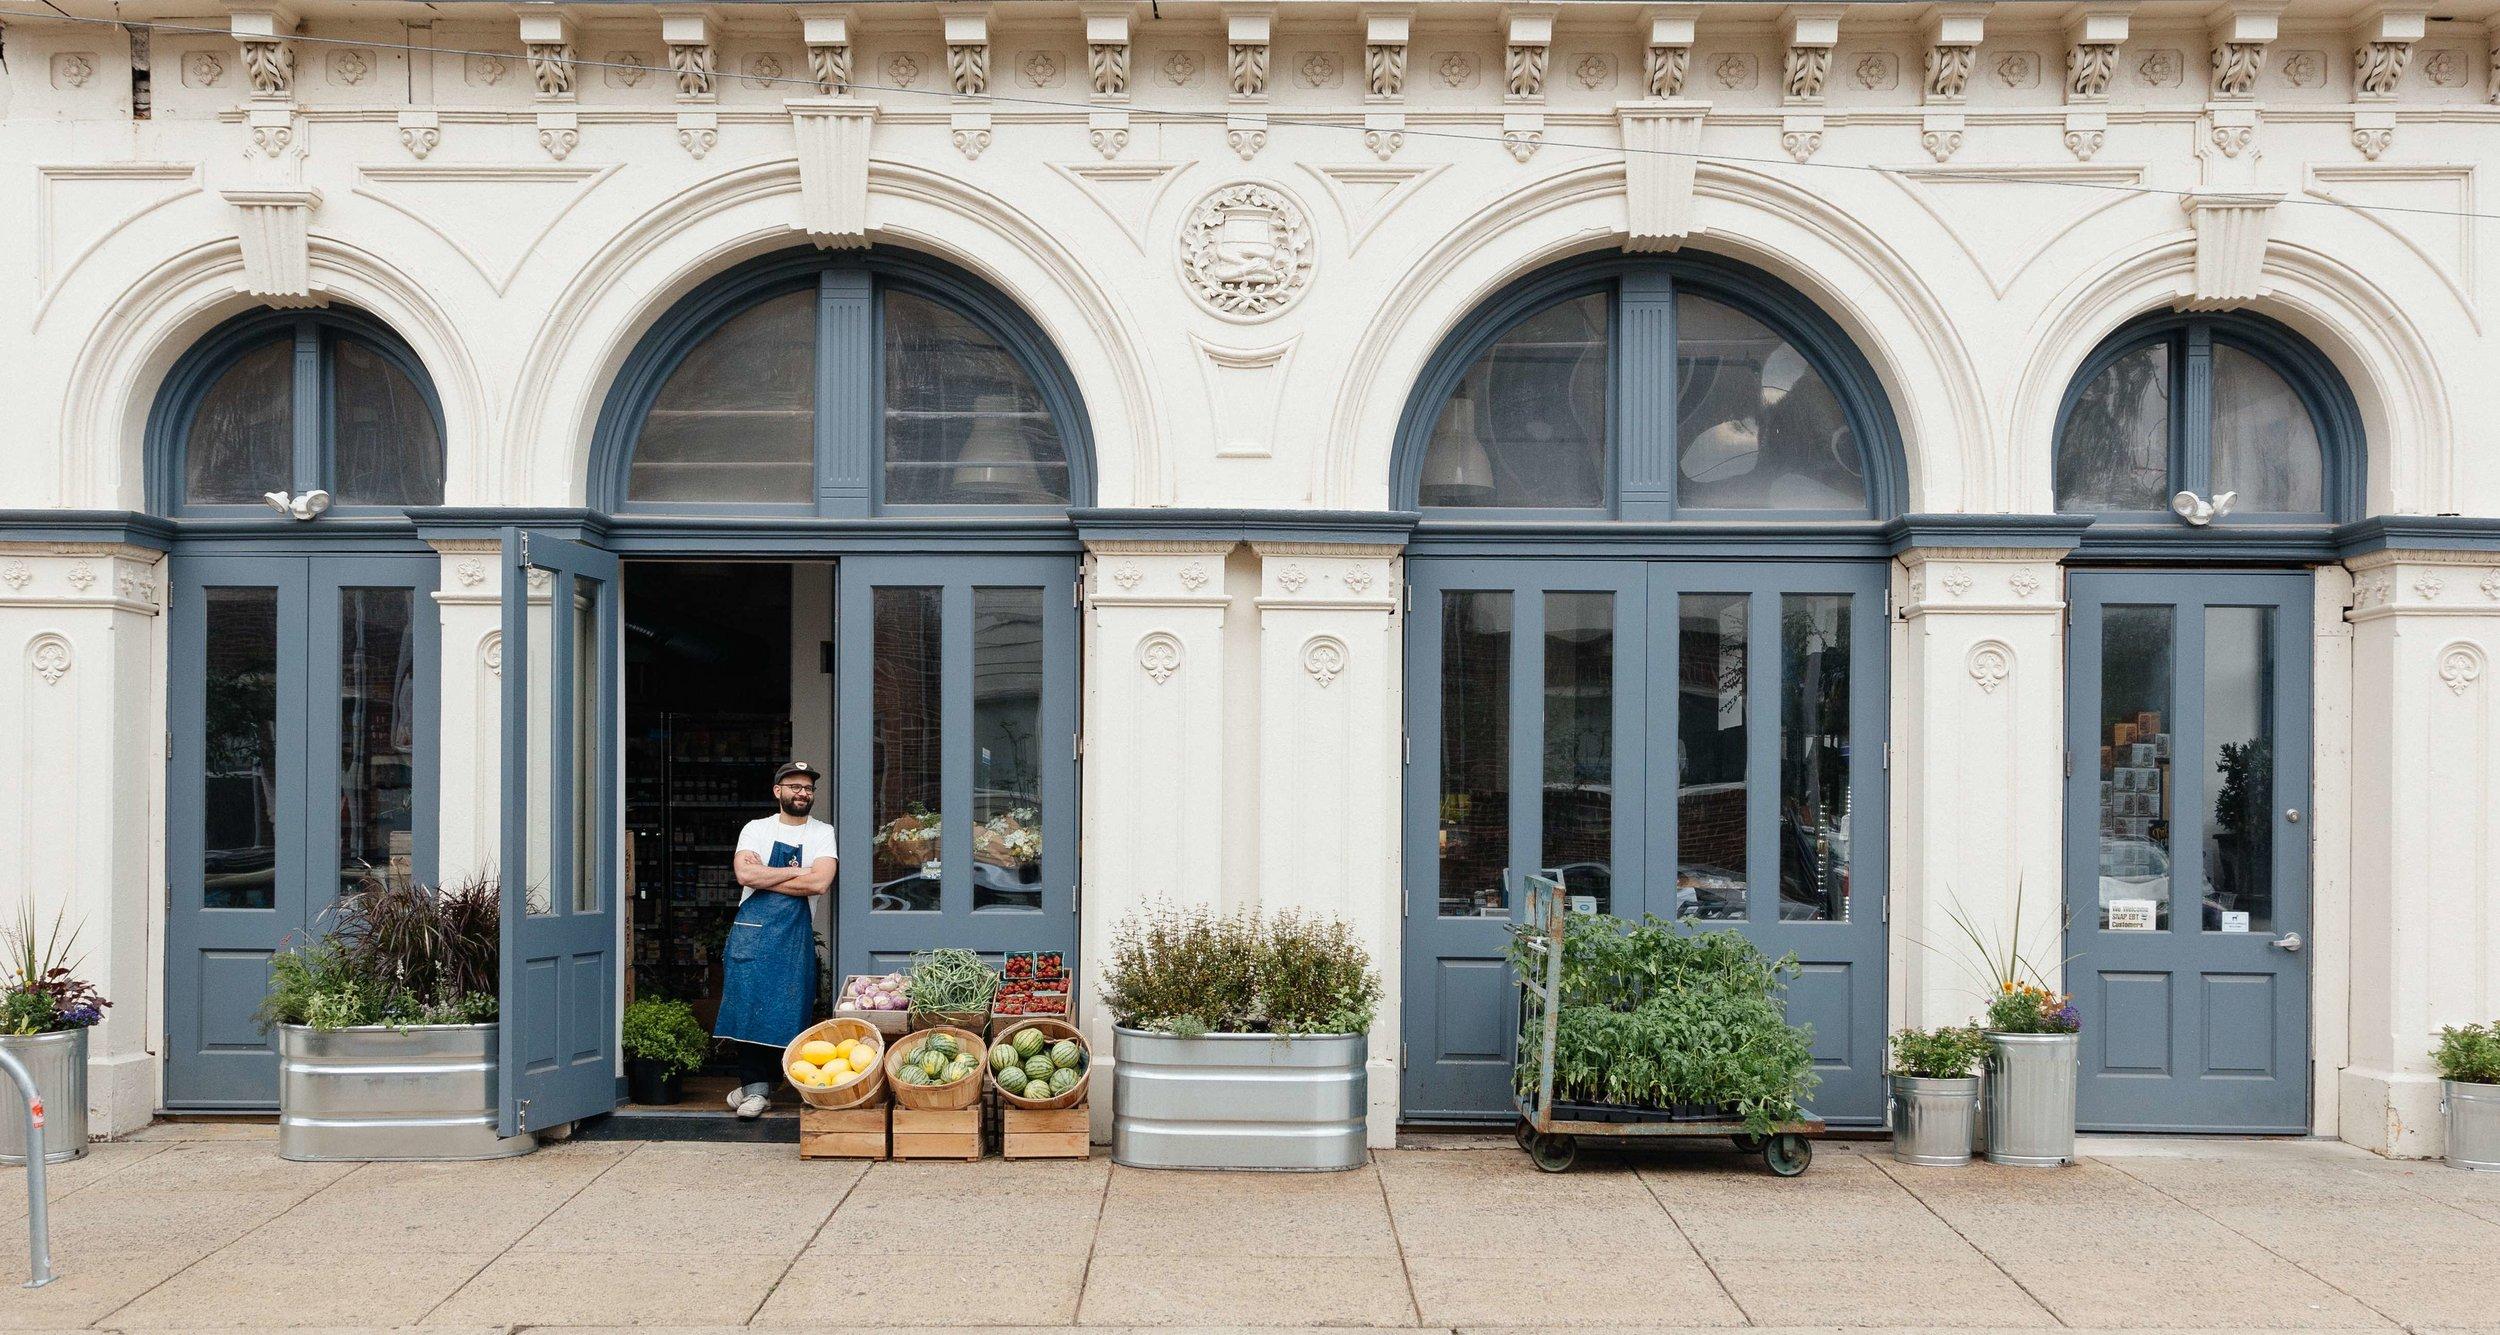 riverwards-produce-market-philadelphia-shop-local-grocery-healthy.jpg